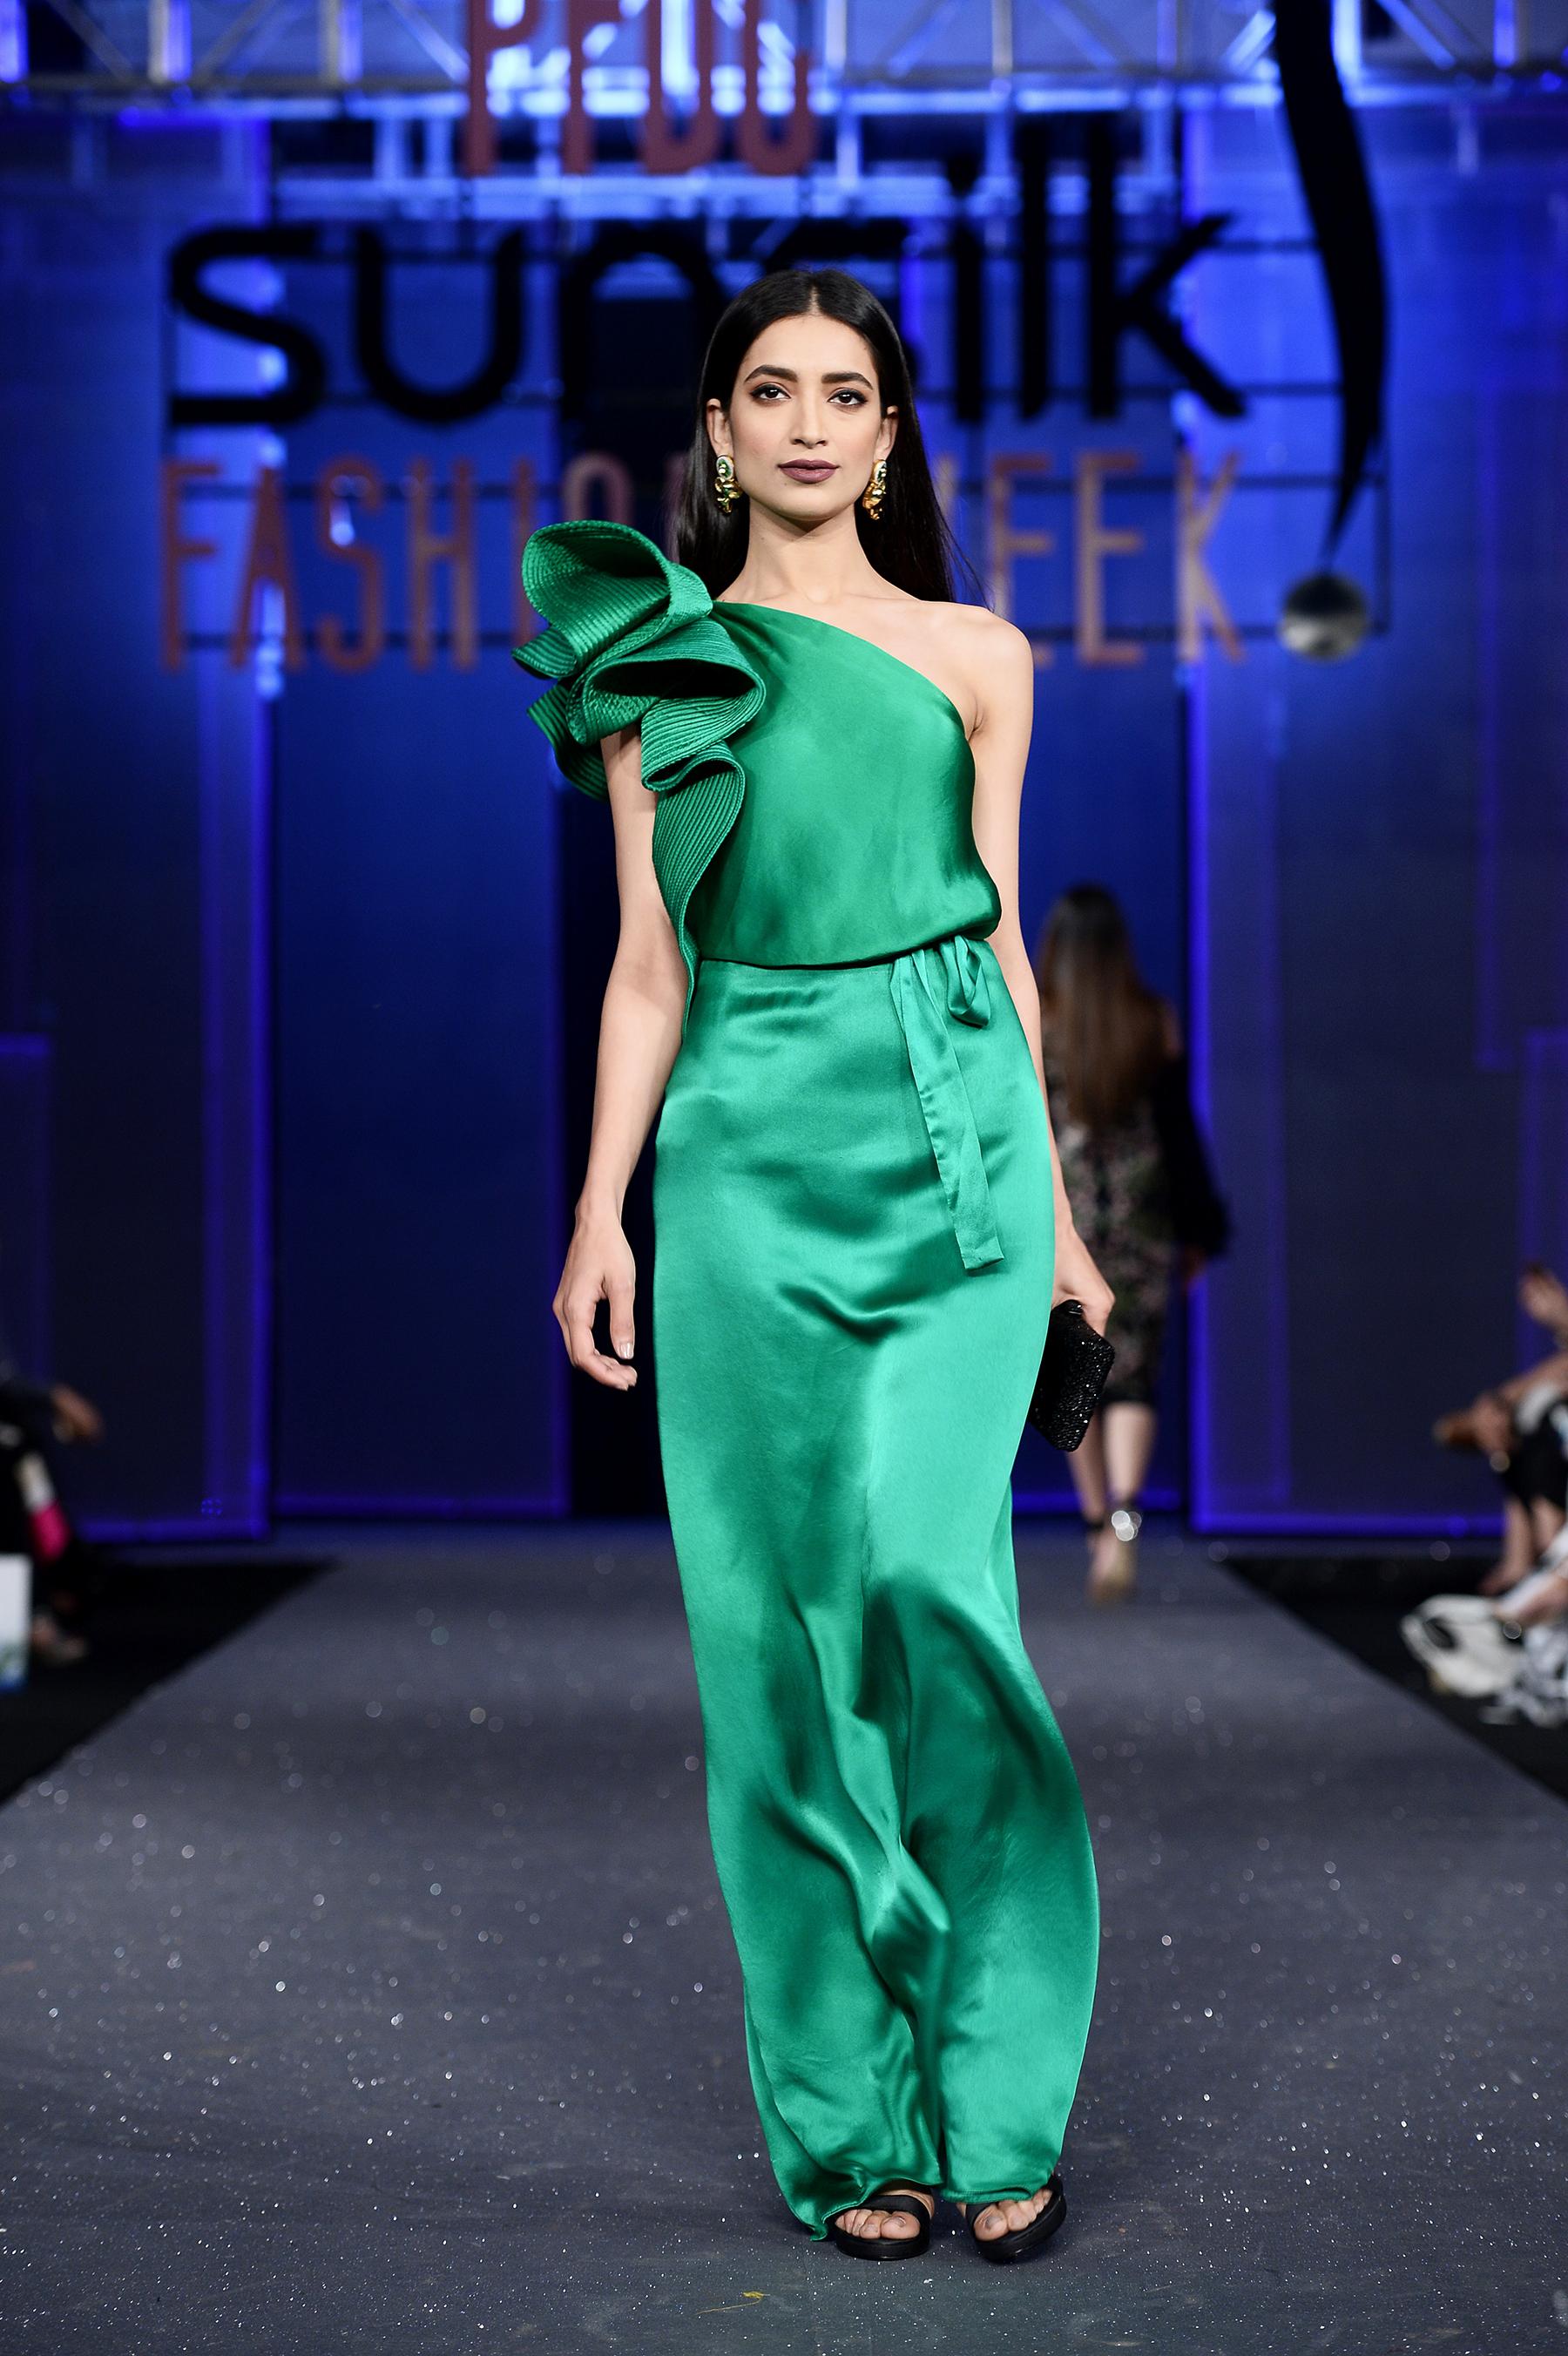 Sana Safinaz - PFDC Sunsilk Fashion Week 2017, Photography: Faisal Farooqui and his team at Dragonfly